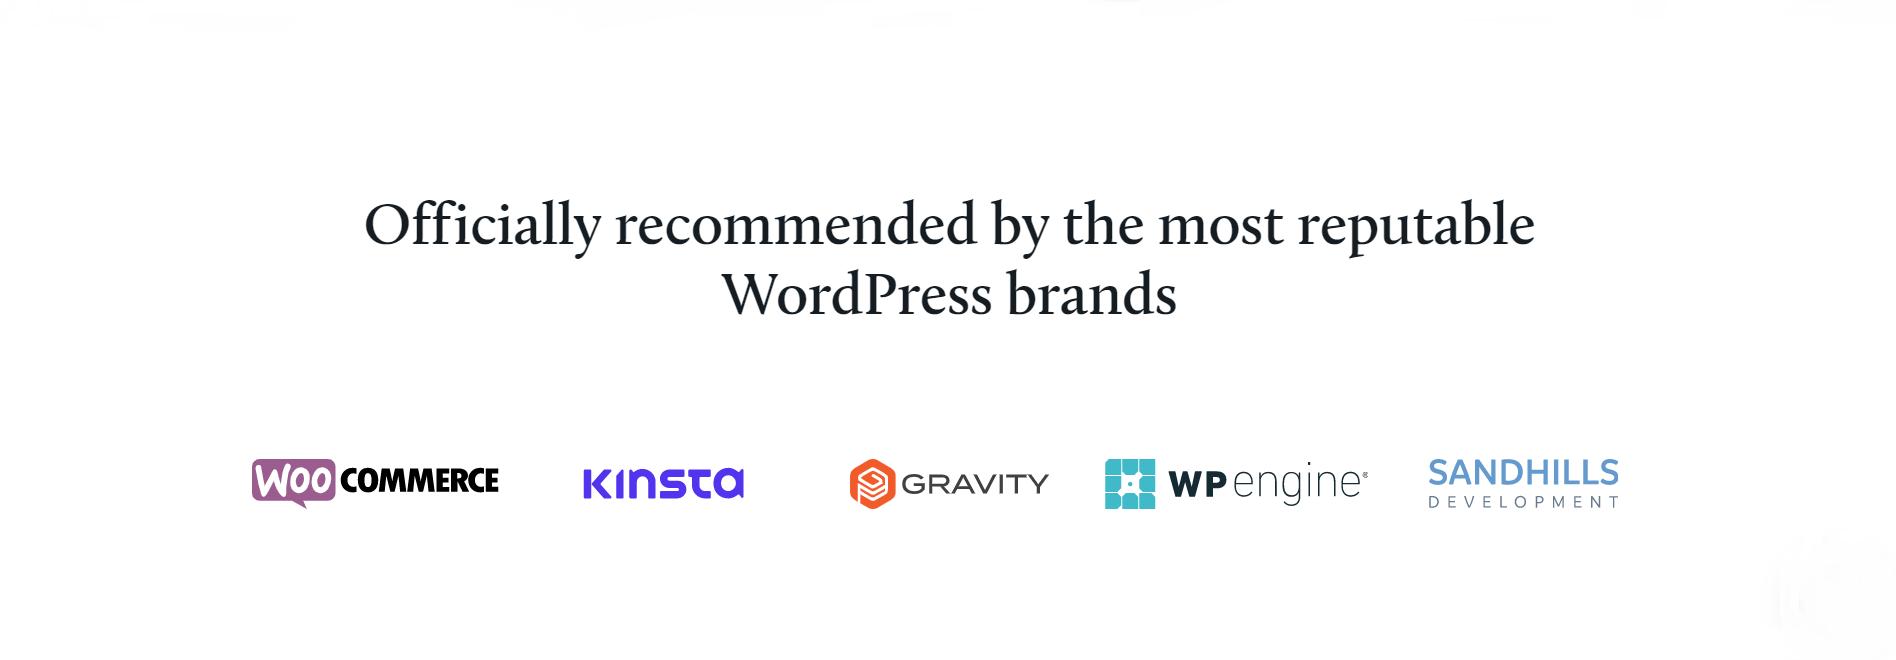 WordPress recommendations